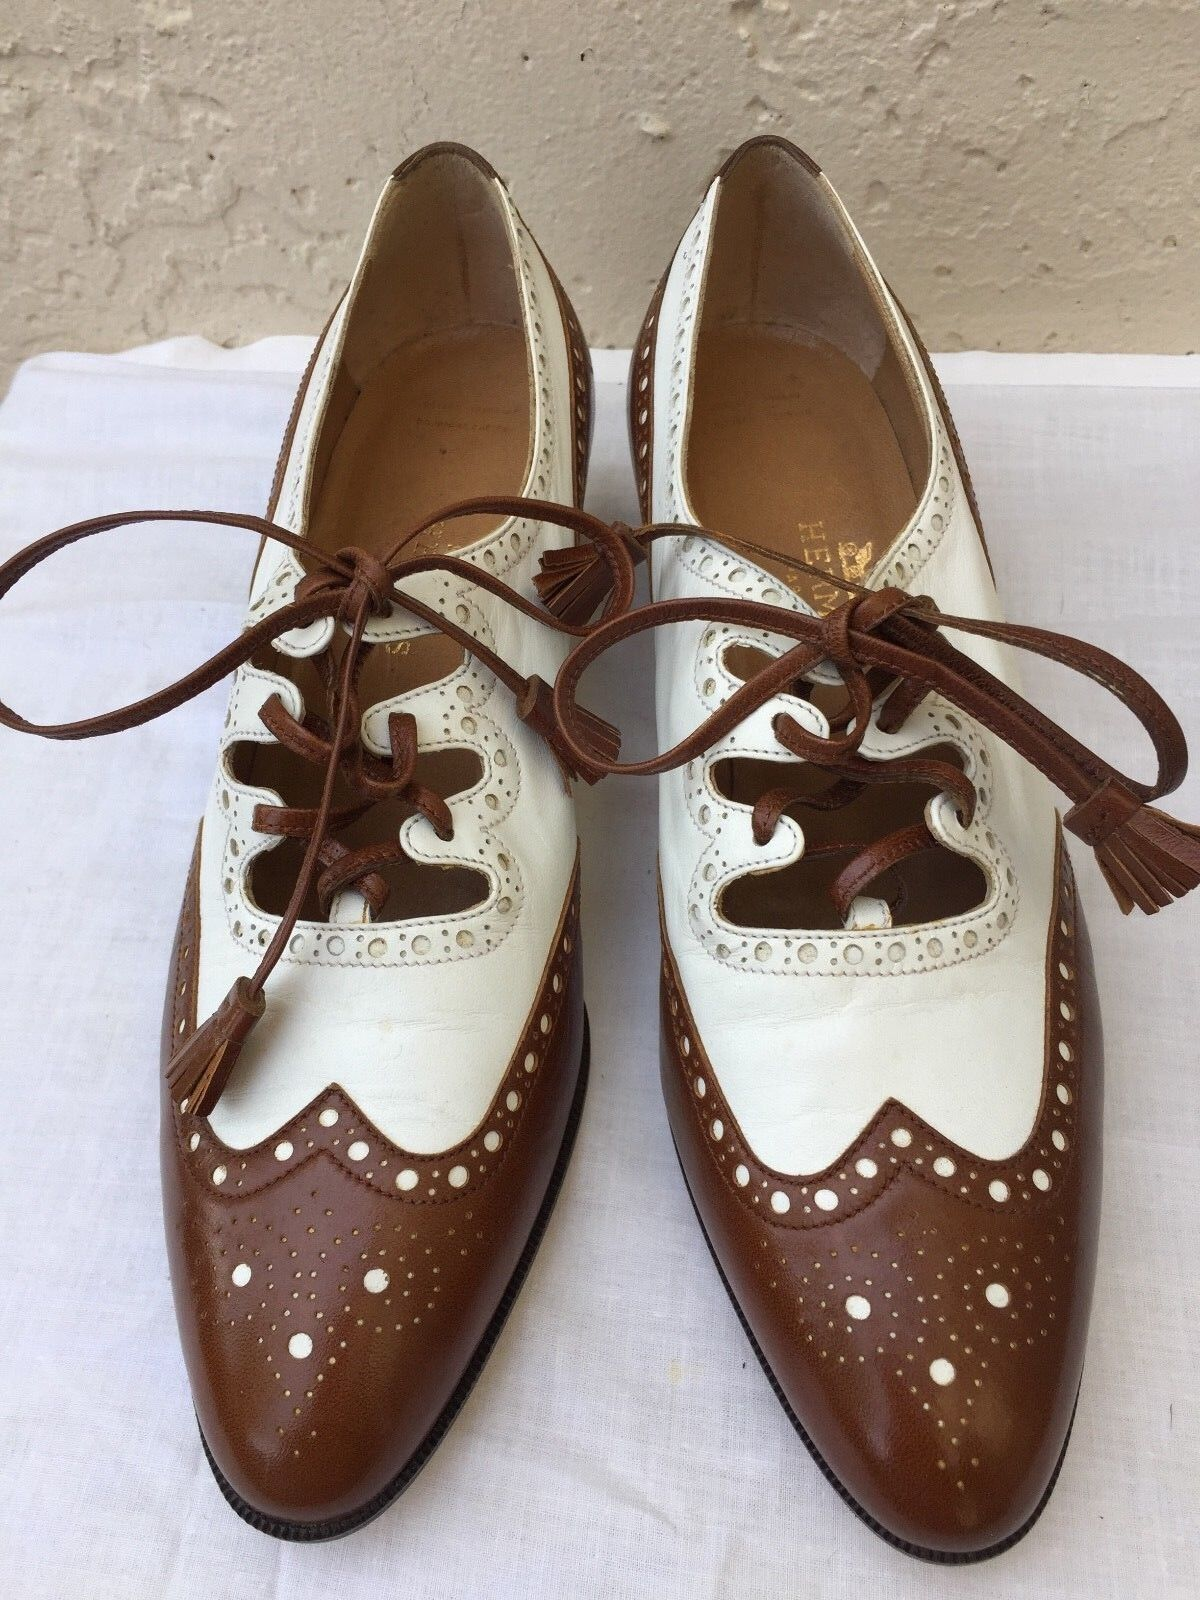 HERMÈS femmes BROGUES OPEN DERBY WINGTIP LACE HEEL marron blanc LEATHER chaussures 8